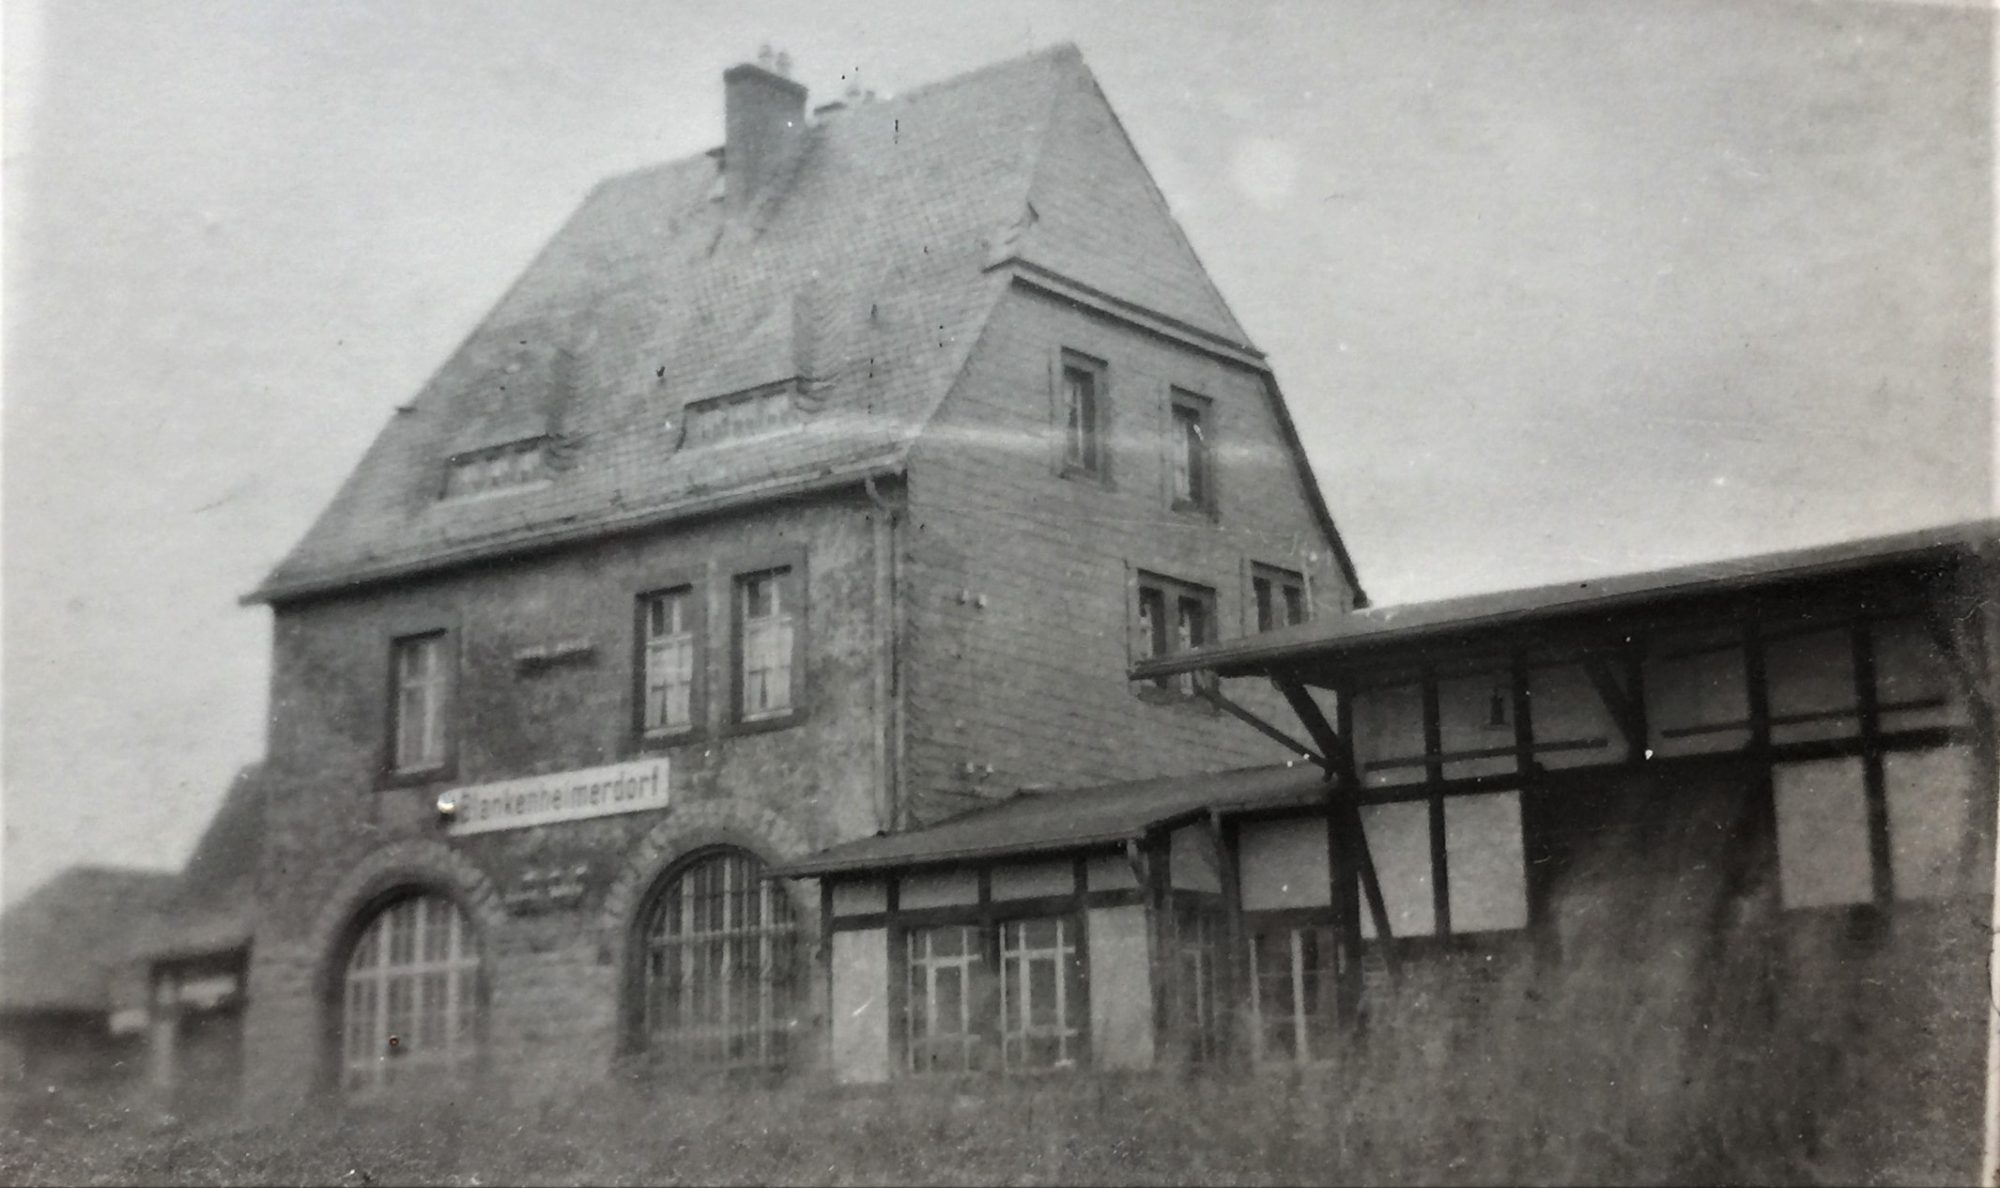 Bahnhof Blankenheimerdorf-ehemaliger Bahnhof Blankenheimerdorf-Lebensraumgestaltung Maria Liebig-Begegnungsraum